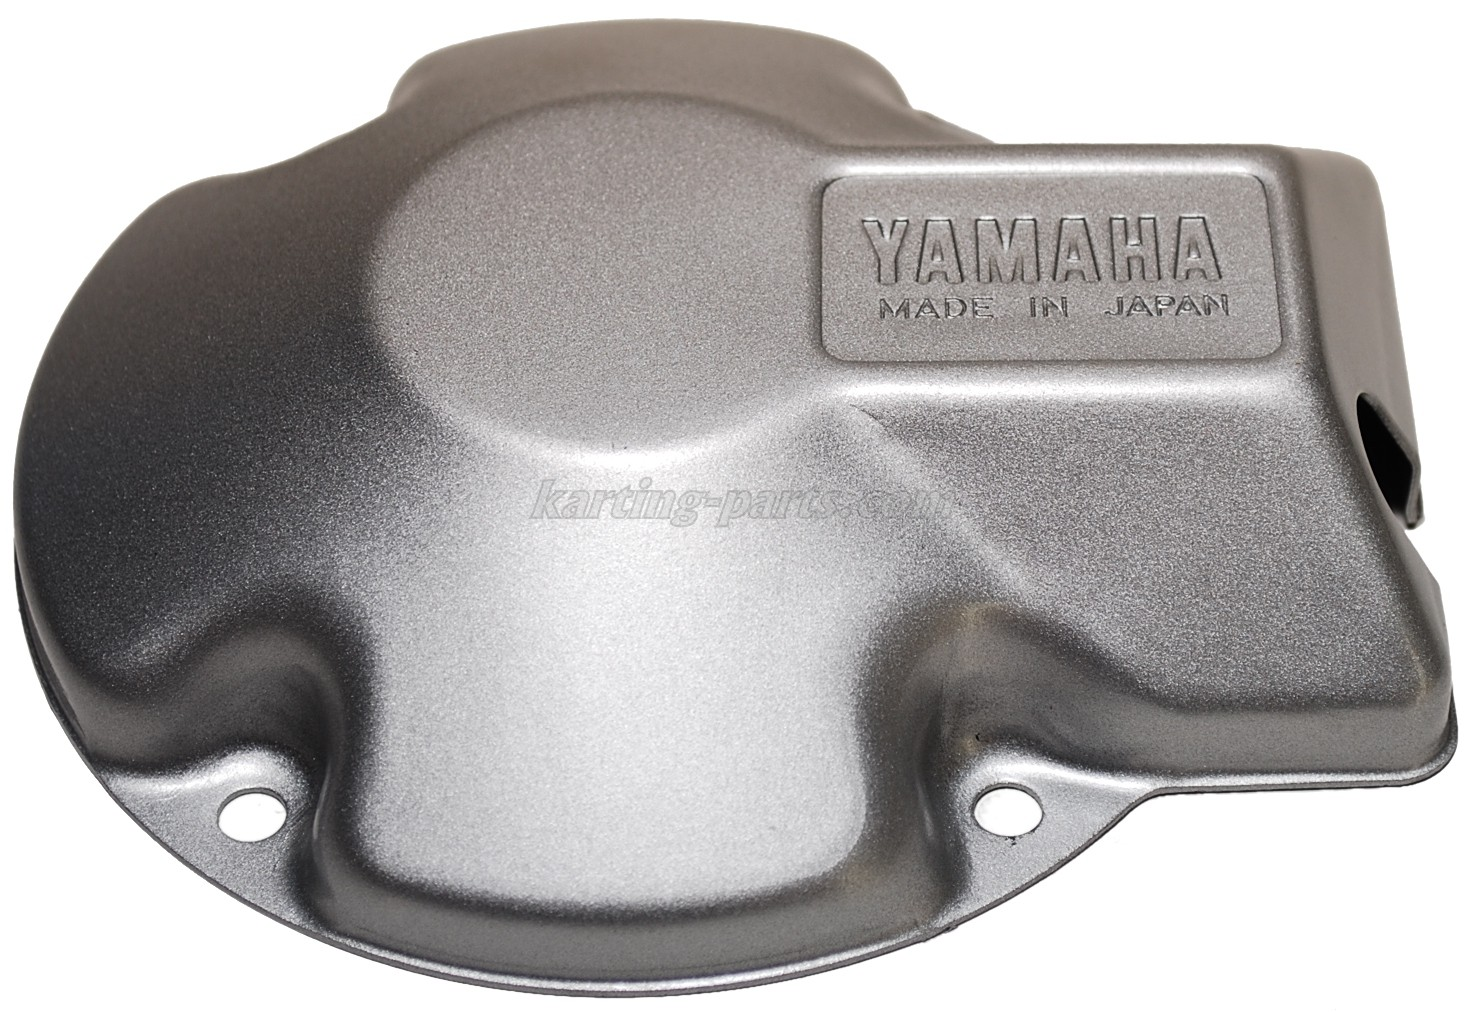 Yamaha KT 100 Crankcase Cover 7F6-15411-02-00